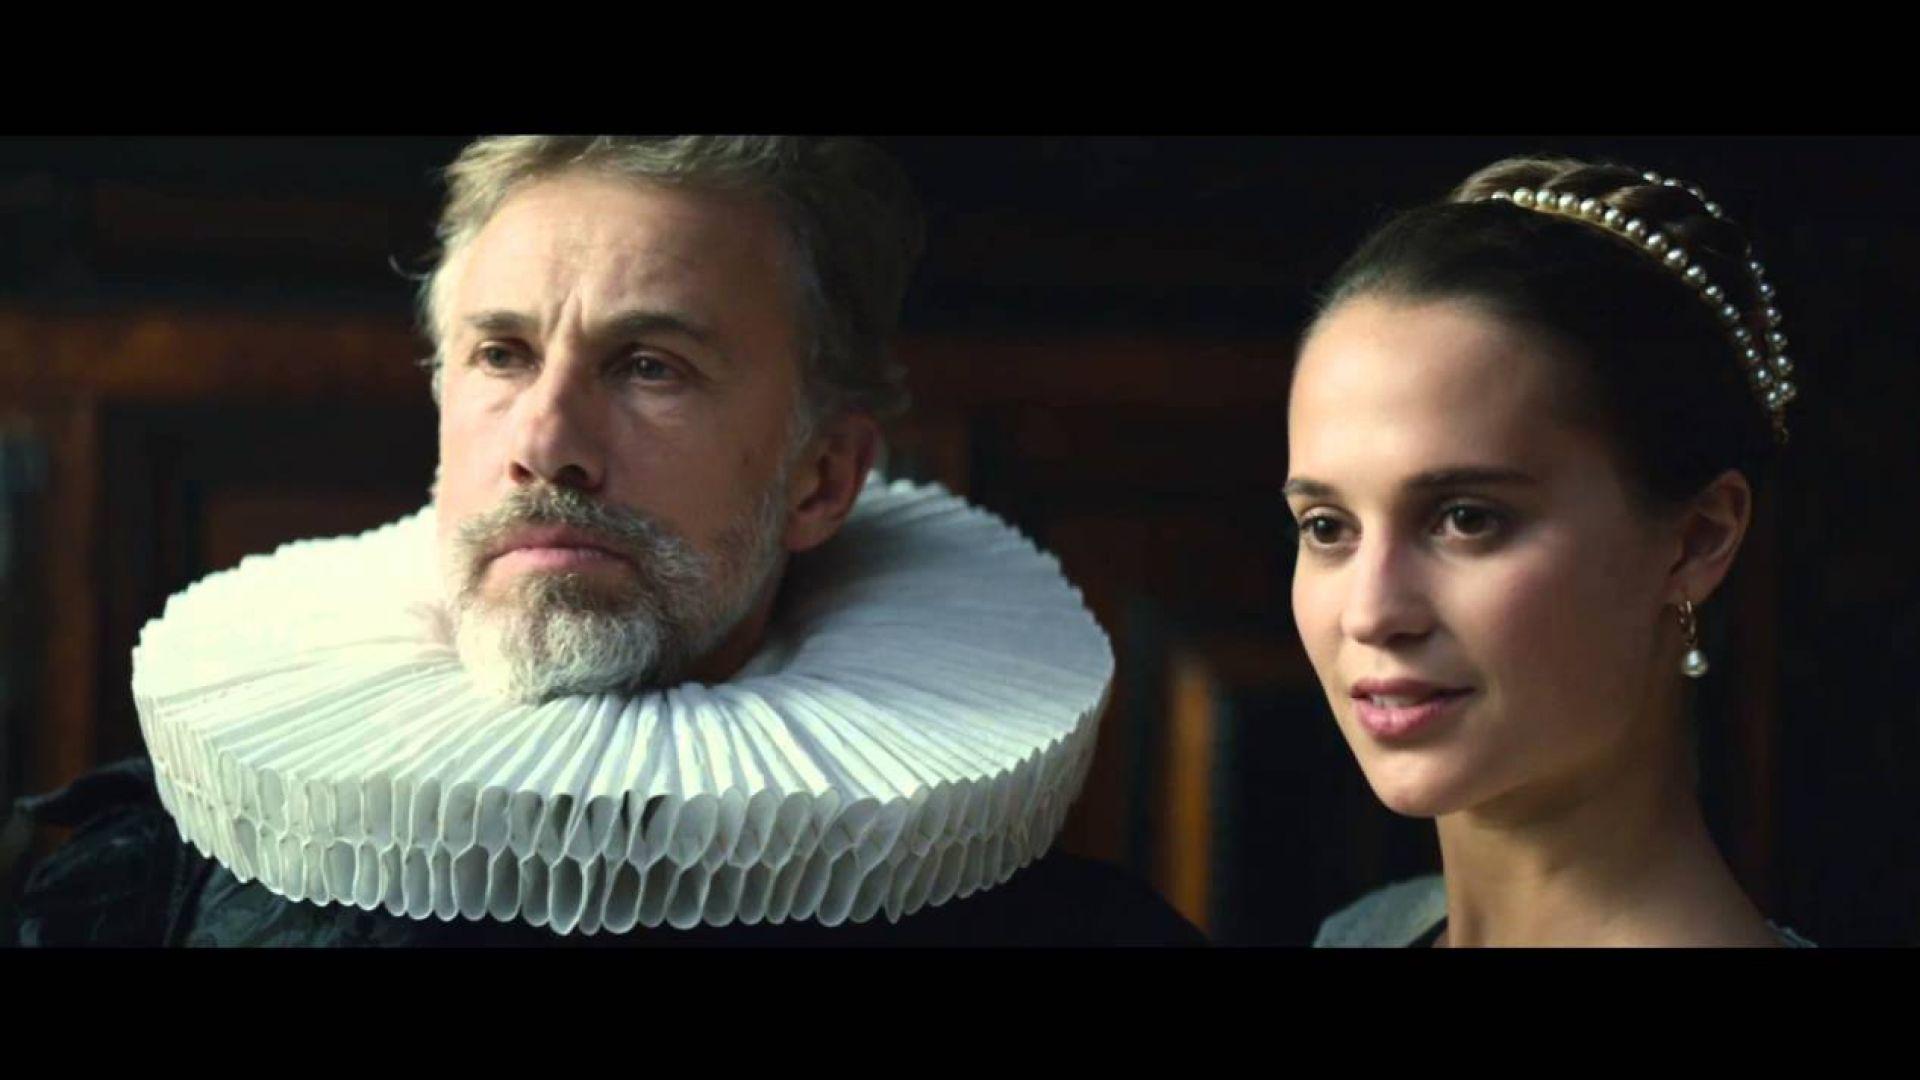 Trailer: Alicia Vikander is magnetic in 'Tulip Fever,' also